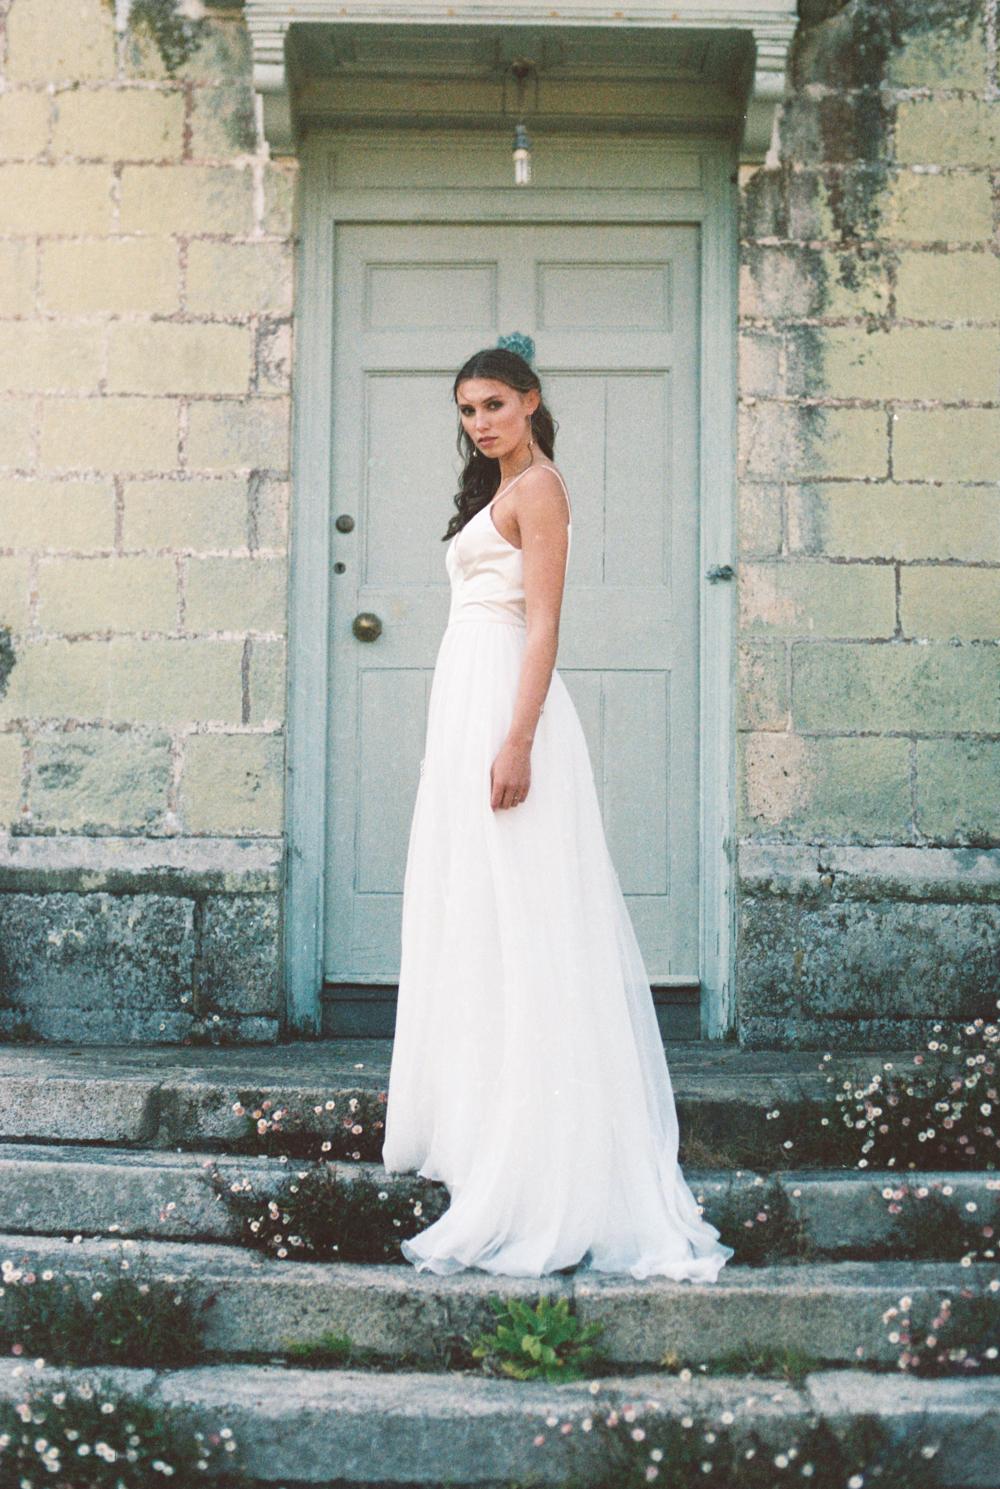 Why I Stopped Photographing Weddings // www.oliviabossert.com // wedding photography, cornwall, fashion photography, photography advise, photography tips, marketing tips, cornwall photographer, wedding photographer, cornwall photographer